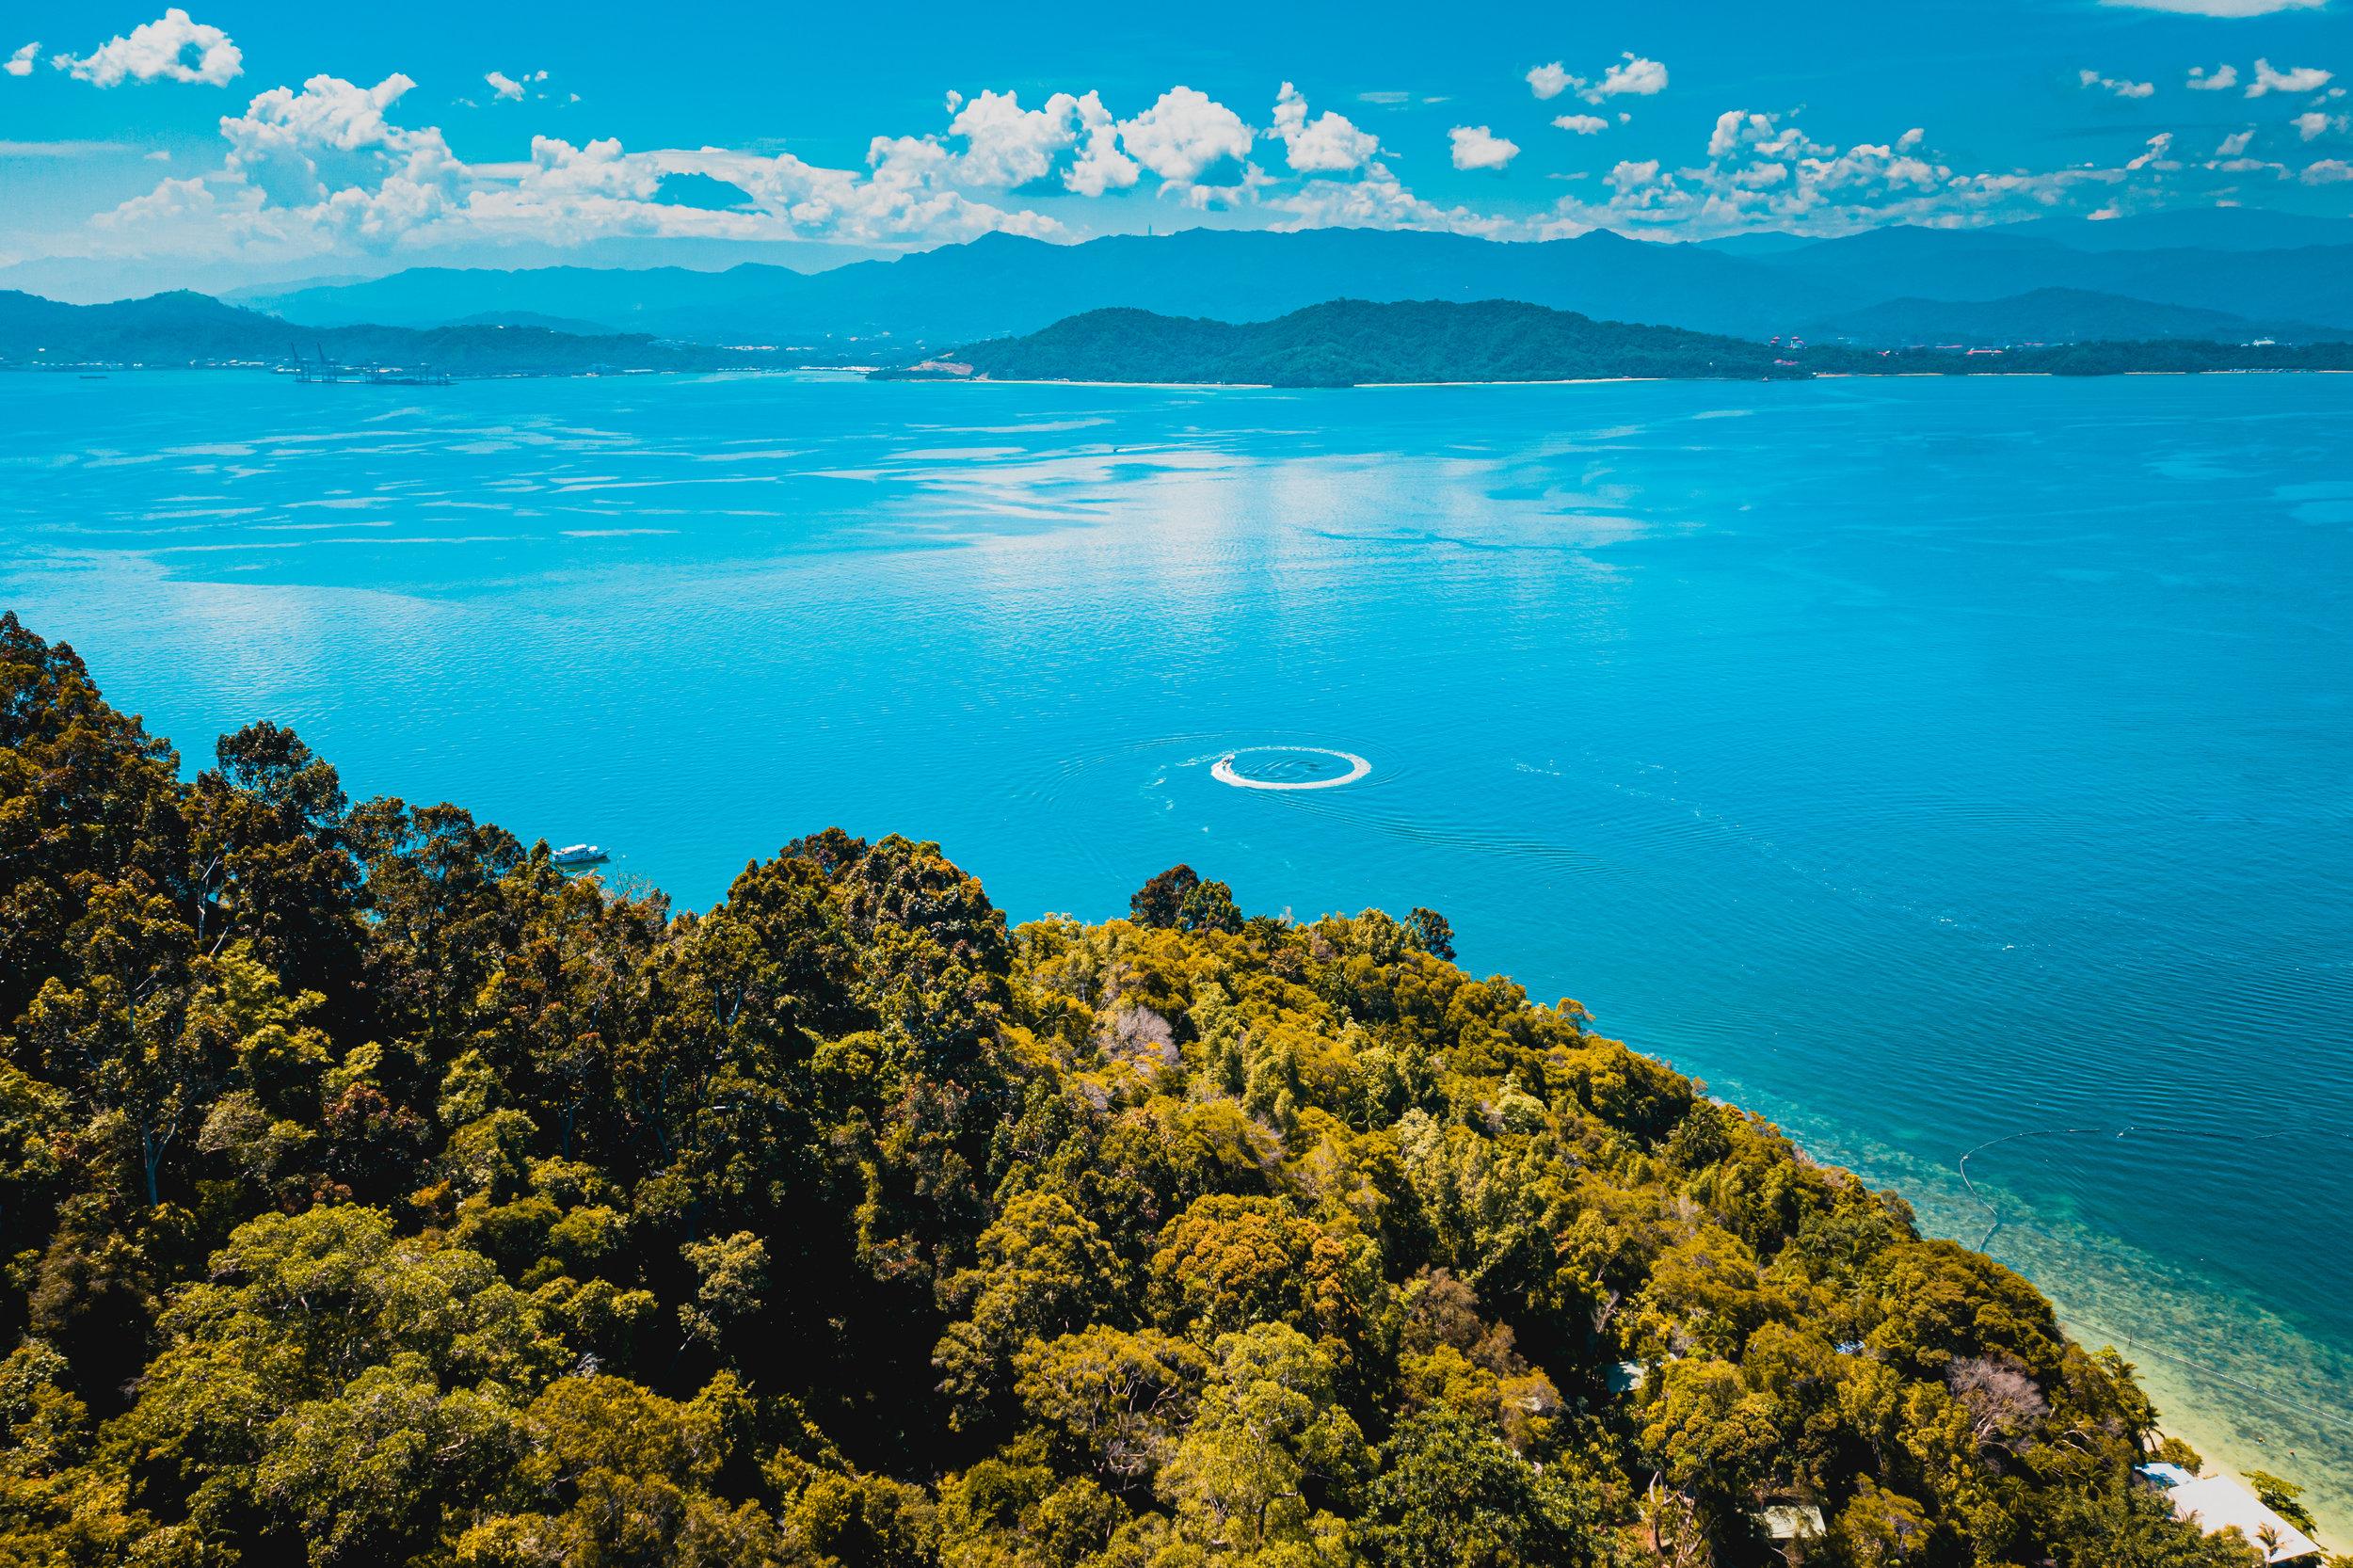 Sepanggar Island, Gaya Bay, and Sabah mainland. Shot on DJI Mavic 2 Pro. Joshua Karthik.